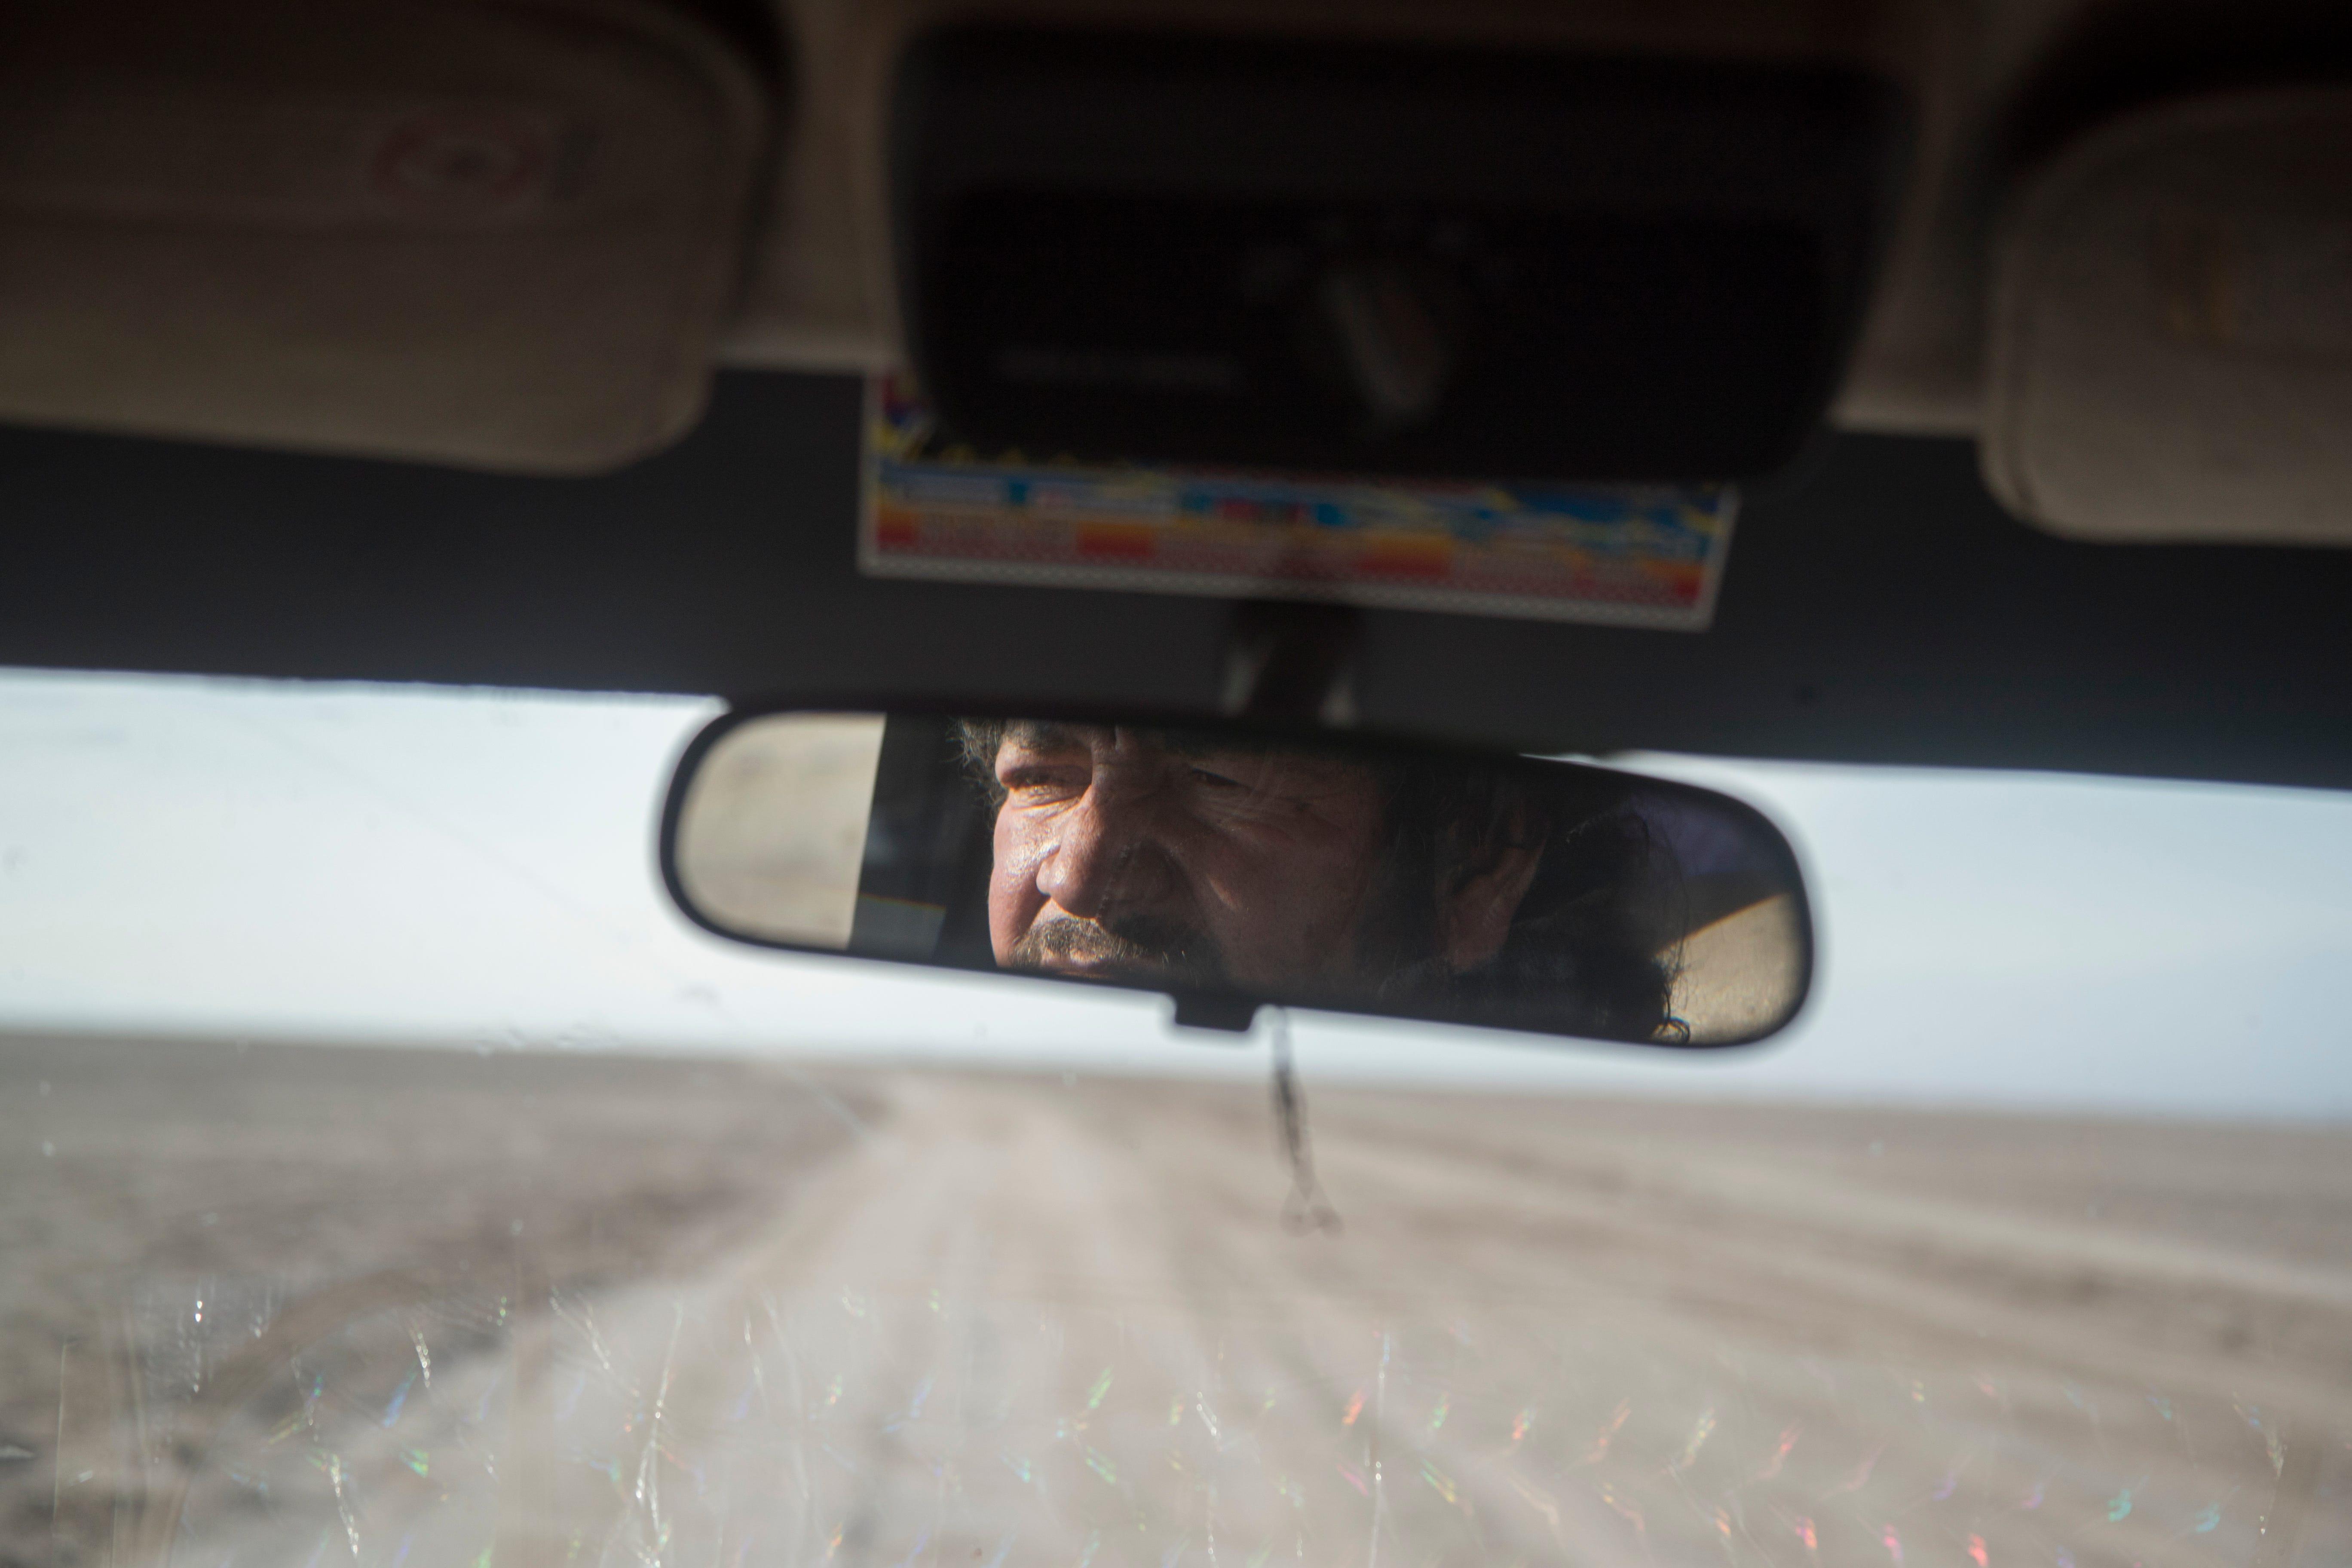 Jesús Antonio Muñoz drives through Laguna Salada, where residents warn of quicksand and swamps.